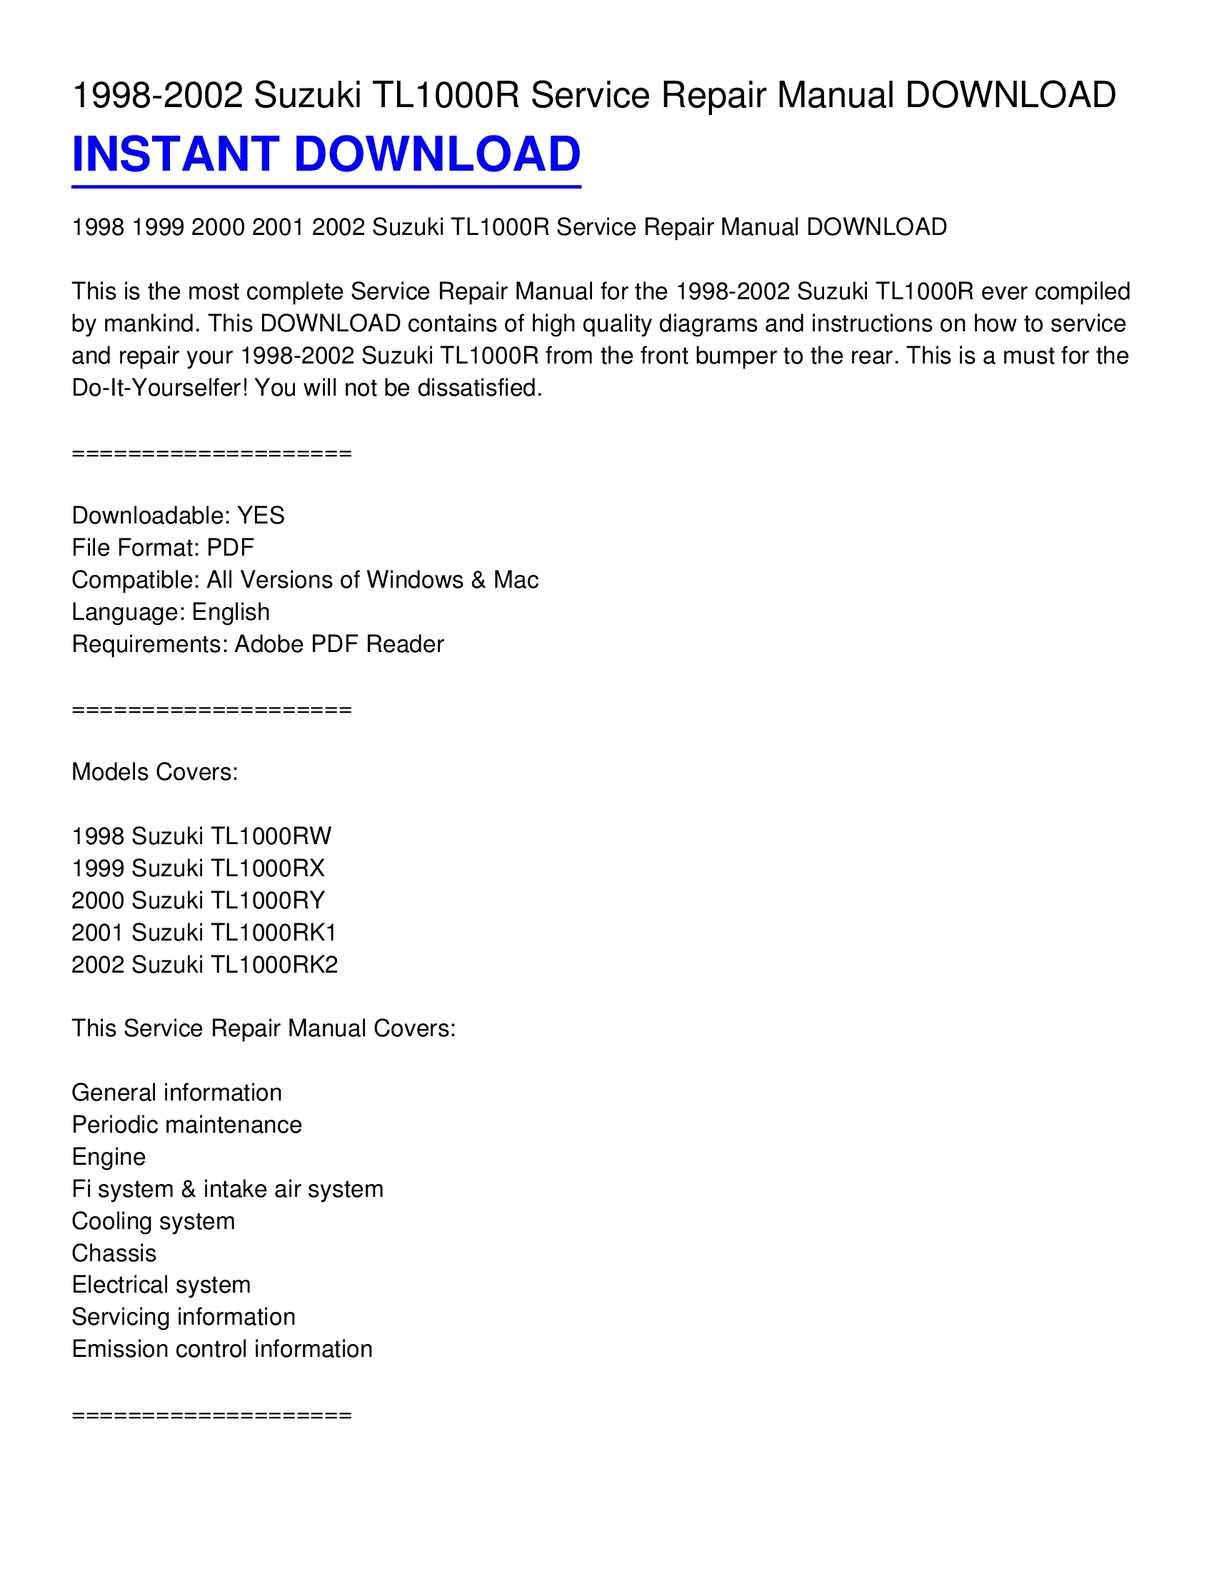 calam o 1998 2002 suzuki tl1000r service repair manual download rh calameo com Suzuki TL1000S Suzuki Hayabusa Turbo